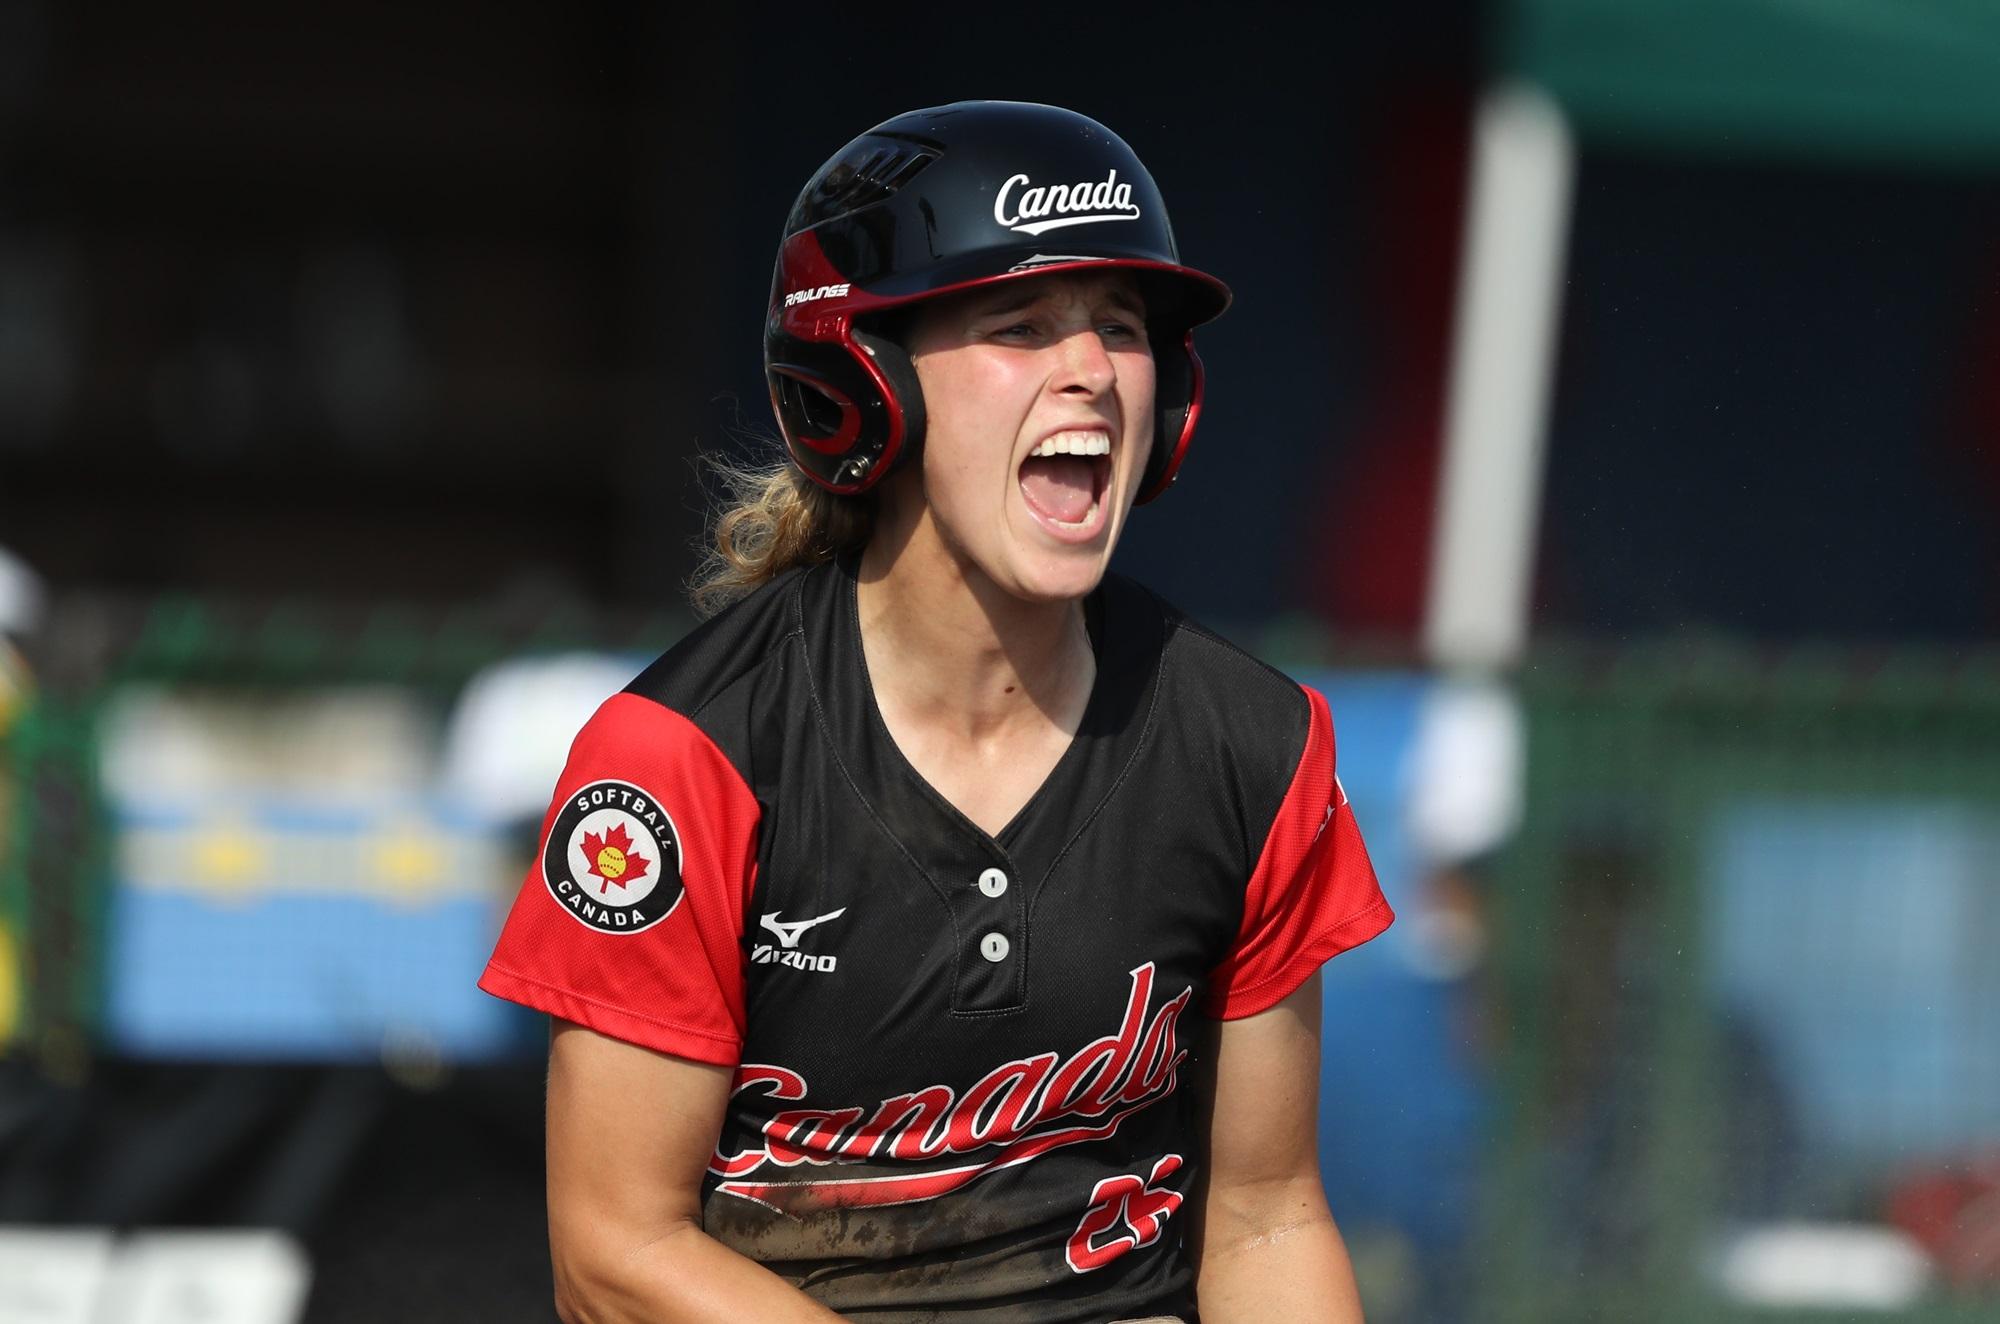 Larissa Franklin after scoring the winning run